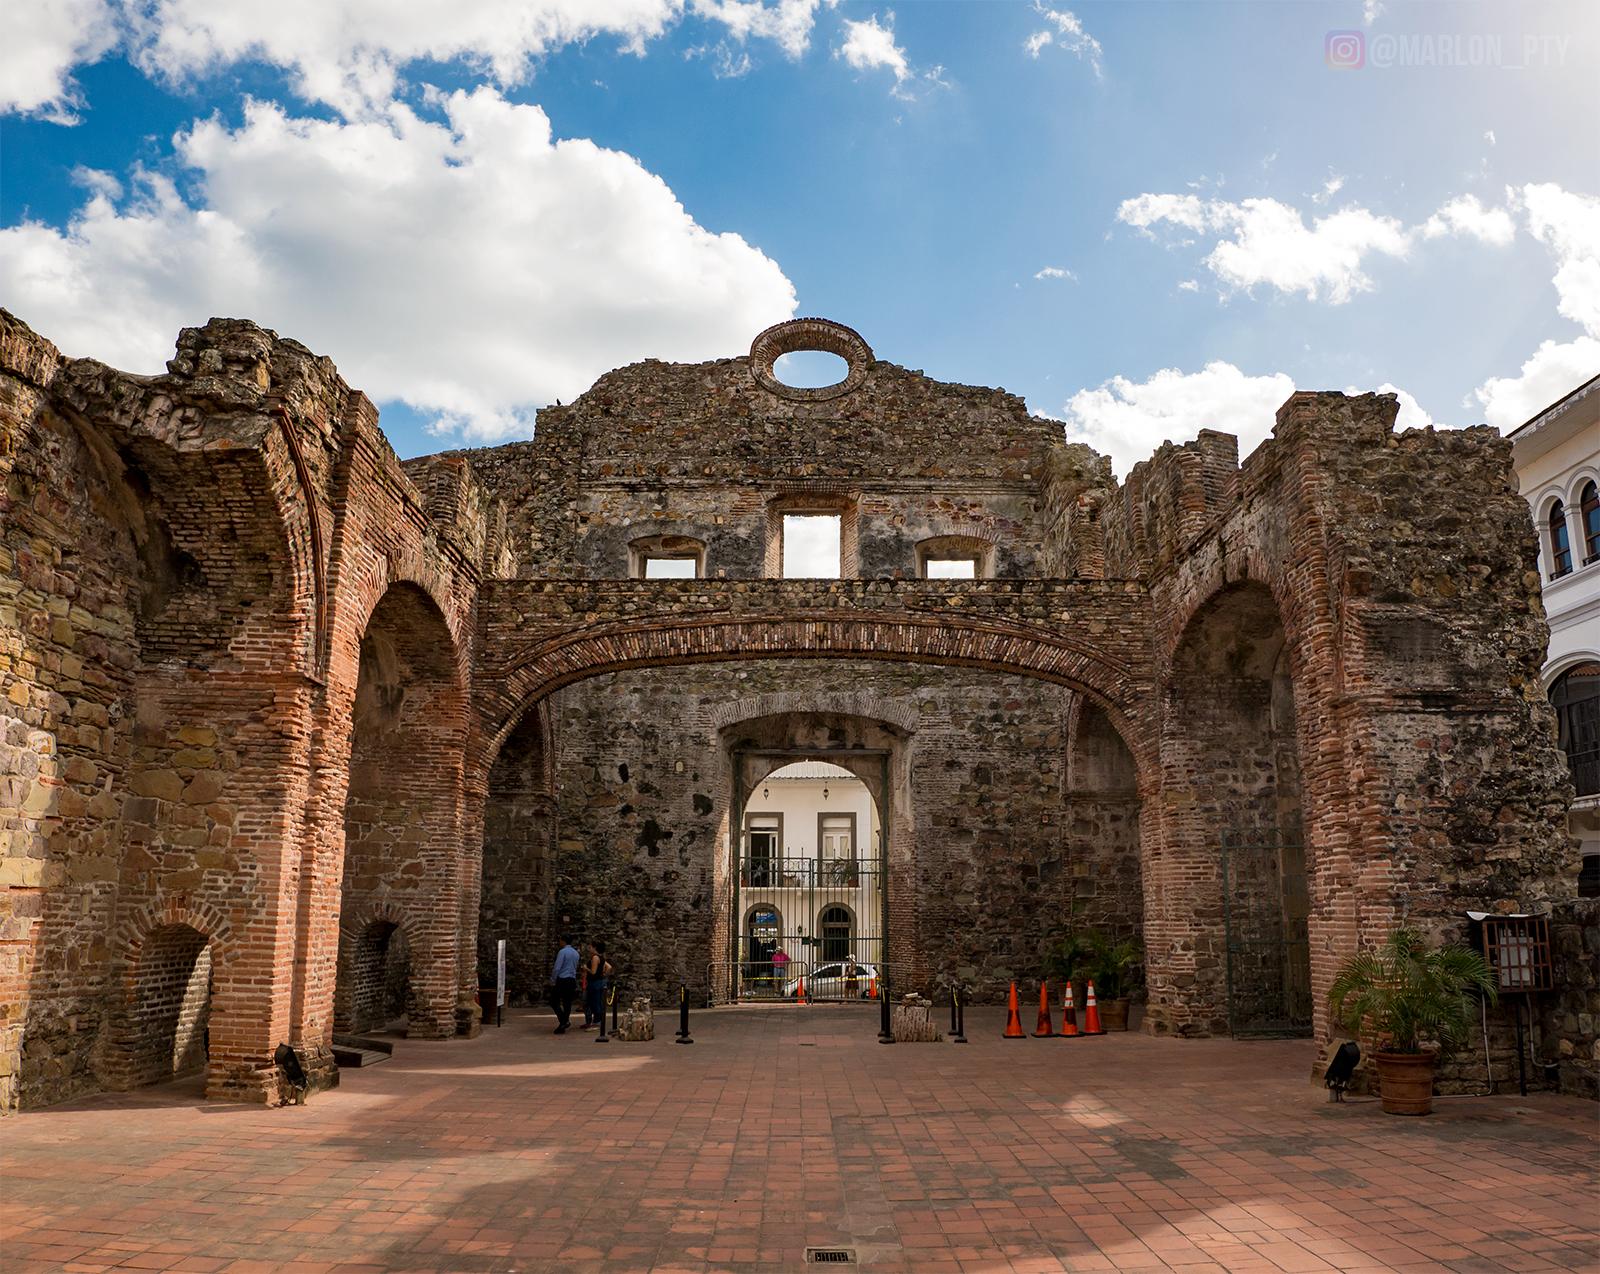 Arco Chato (Flat Arch), Casco Viejo, Panamá. Photo: Marlon I. Torres